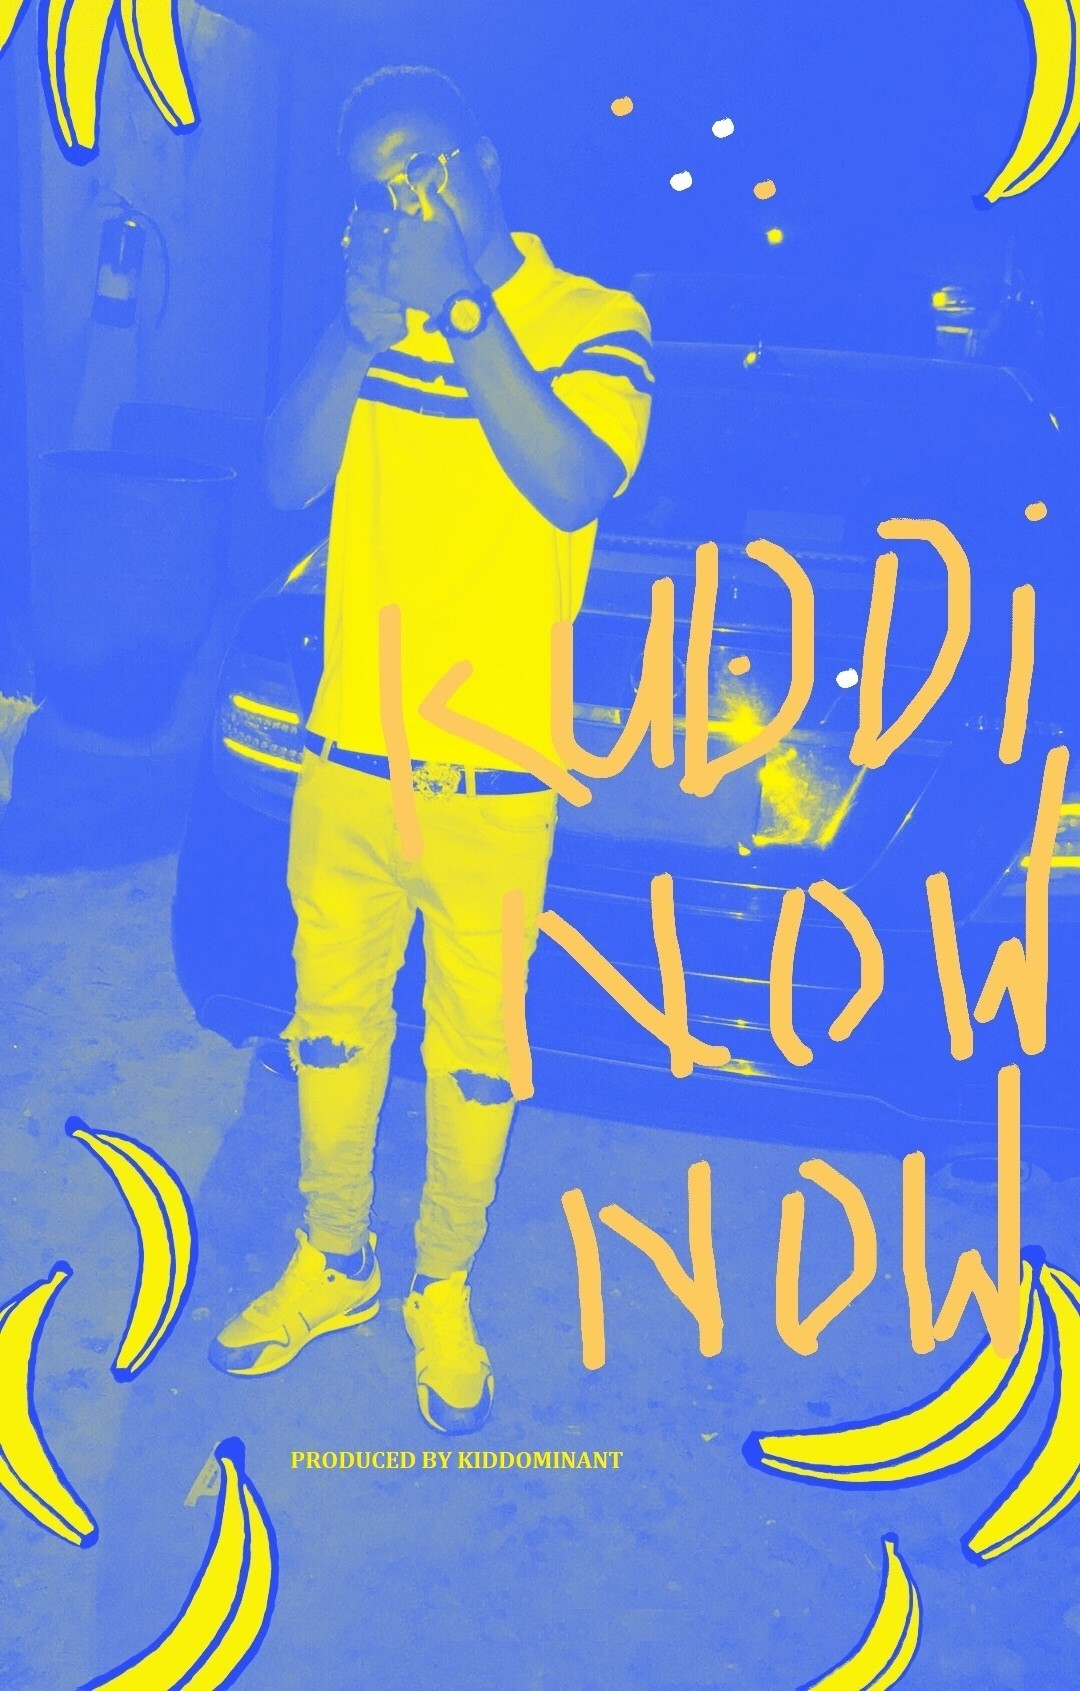 Kuddi – Now Now (Prod. by Kiddominant)